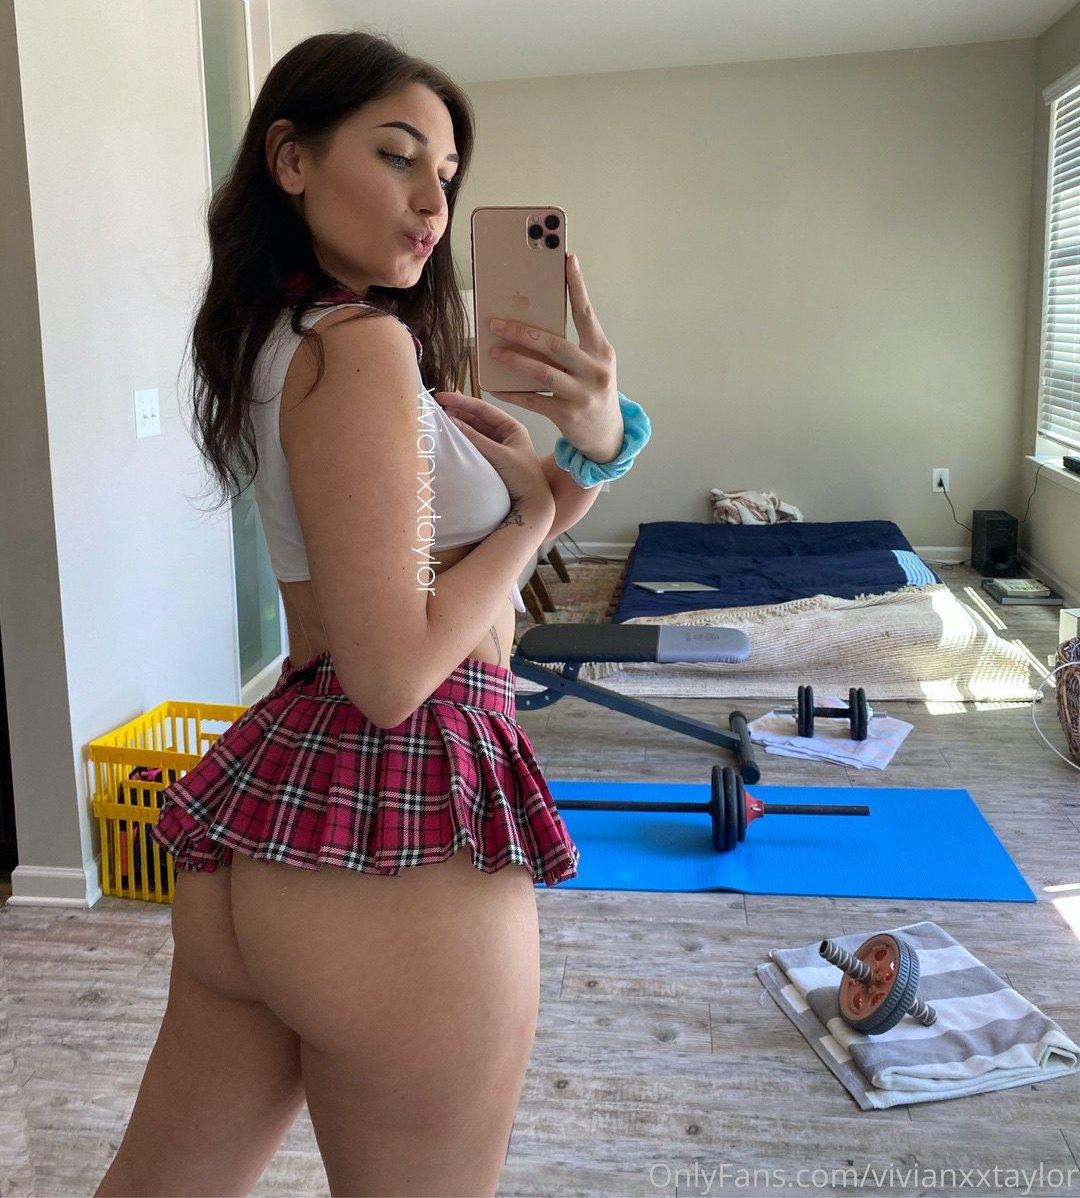 Vivian Taylor Vivianxxtaylor Onlyfans Nudes Leaks 0001